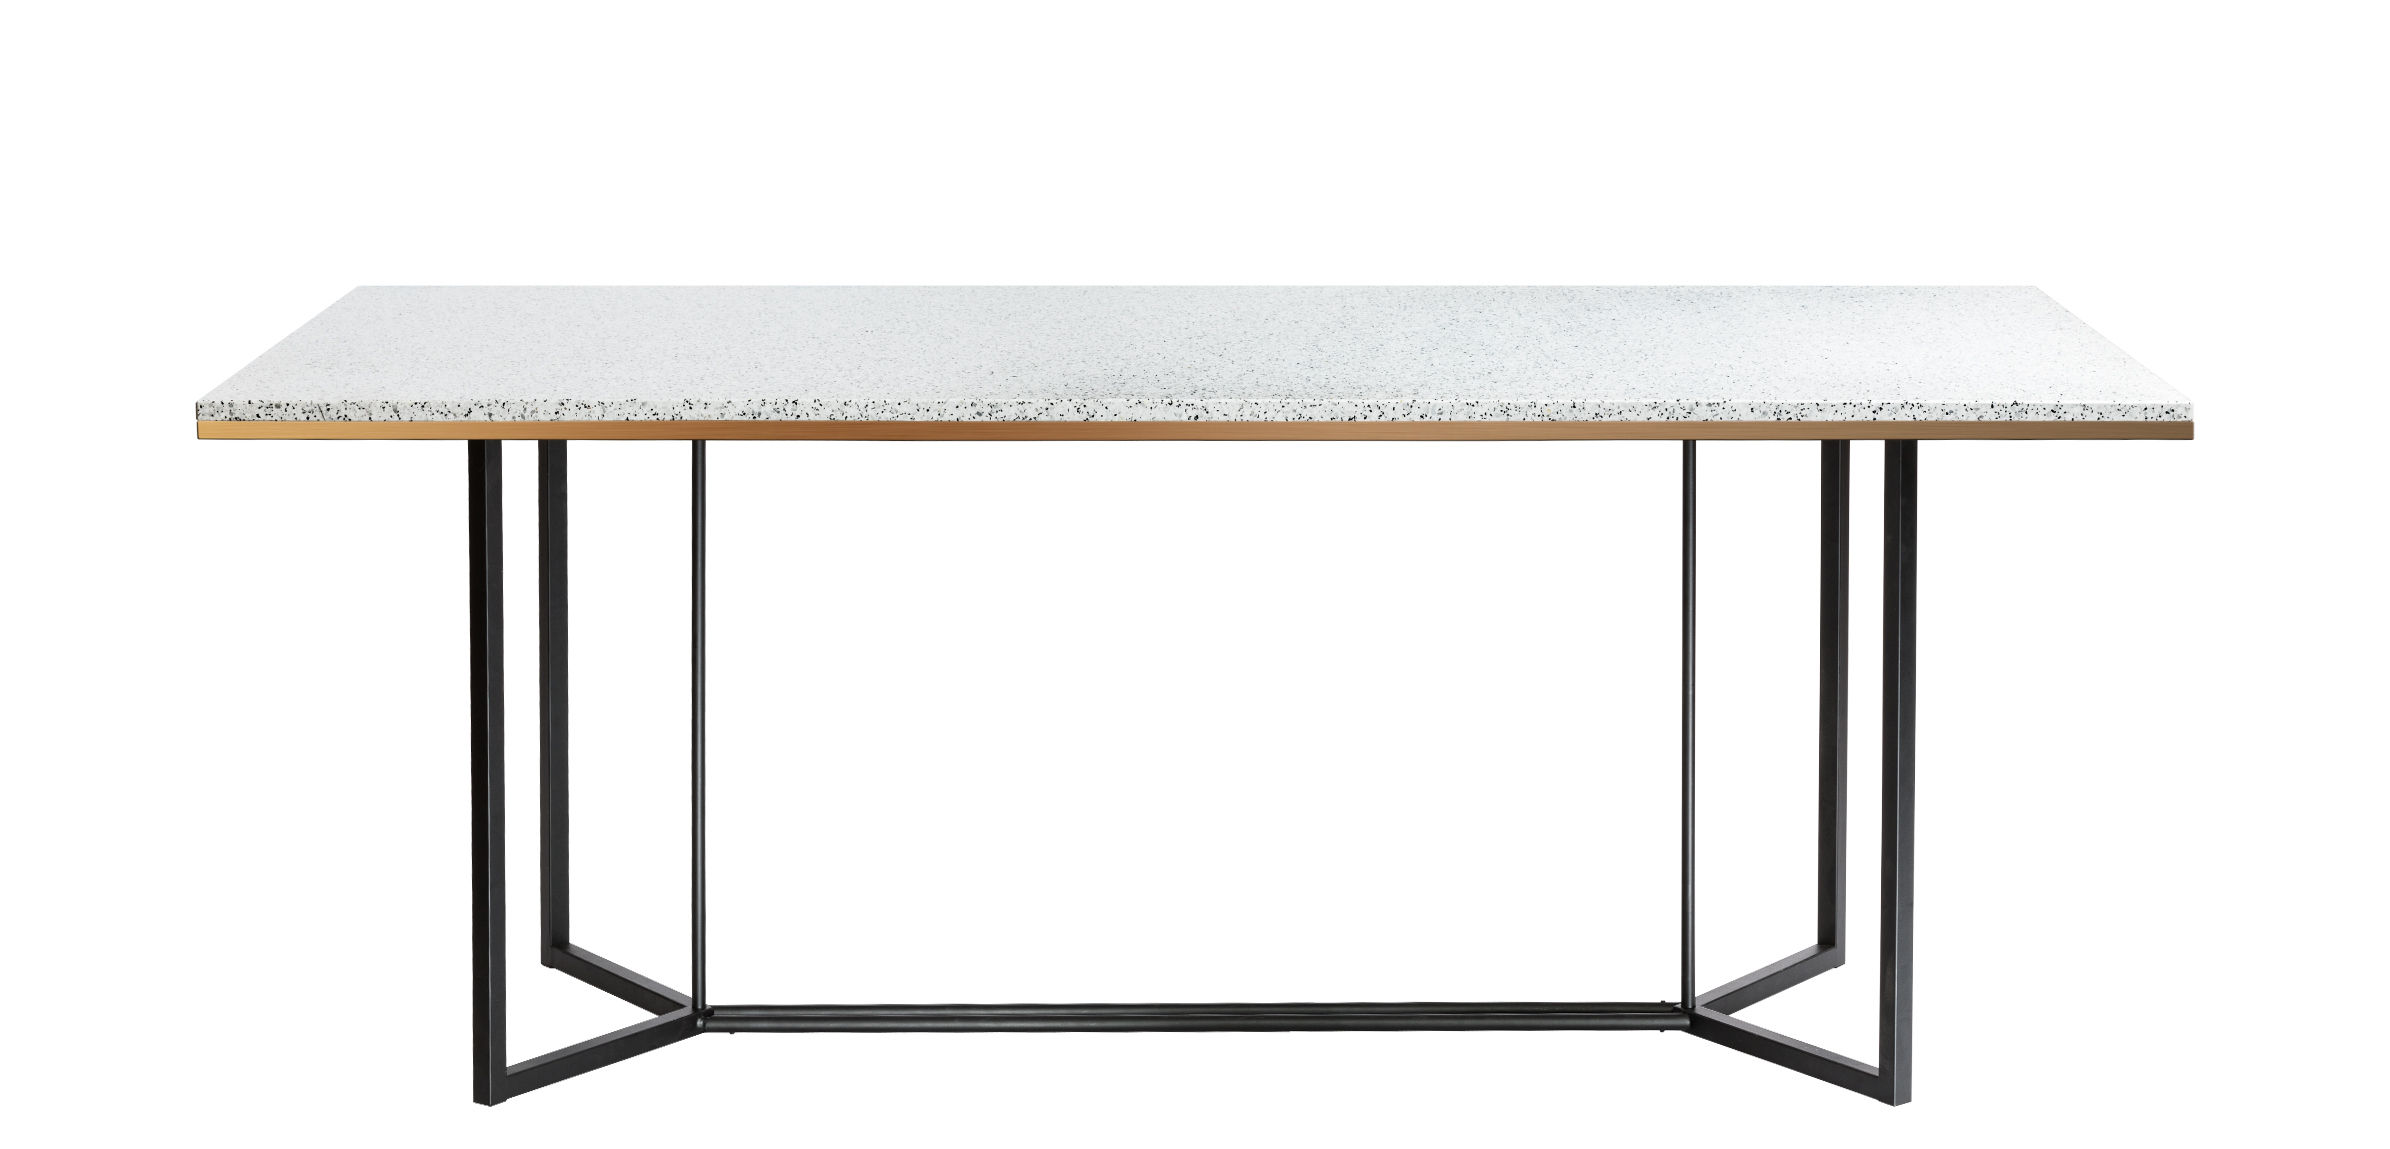 Dossiers - Tendance Nature moderne - Table Terrazzo / 190 x 90 cm - RED Edition - Blanc - Acier laqué, Bois, Laiton, Terrazzo